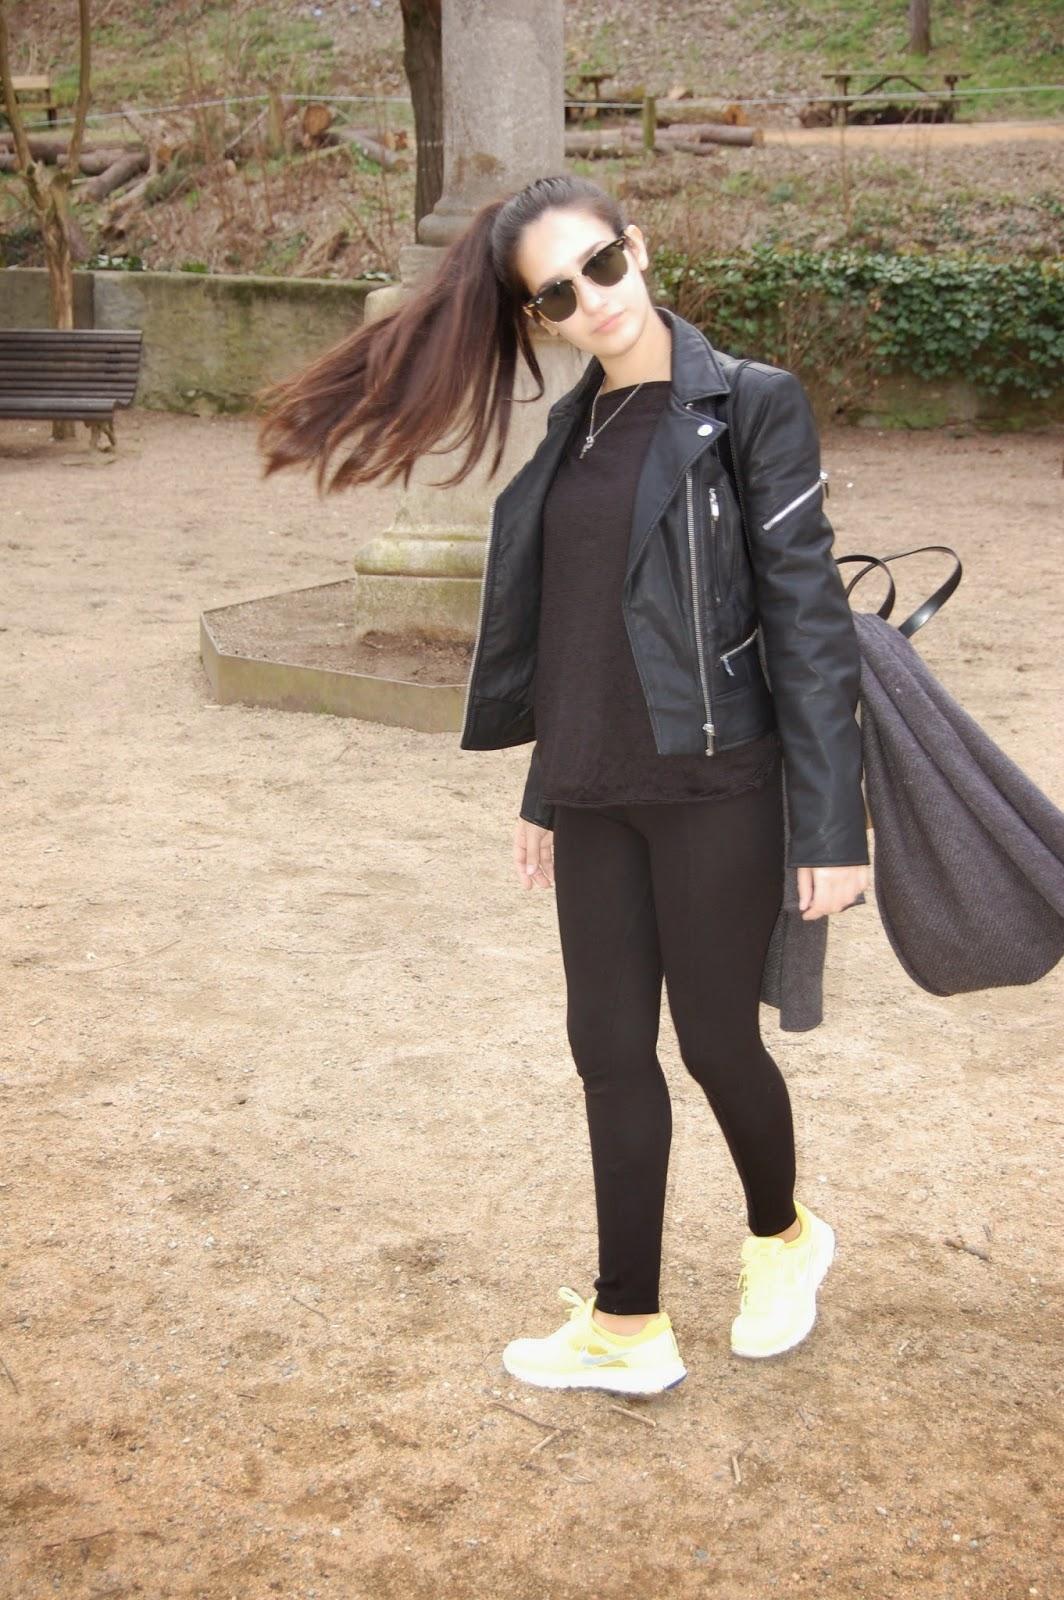 cazadora negra zara, jersey negro mango, leggins negros zara, zapatillas nike amarillas, bolso beig bimba&lola, bufanda gris zara